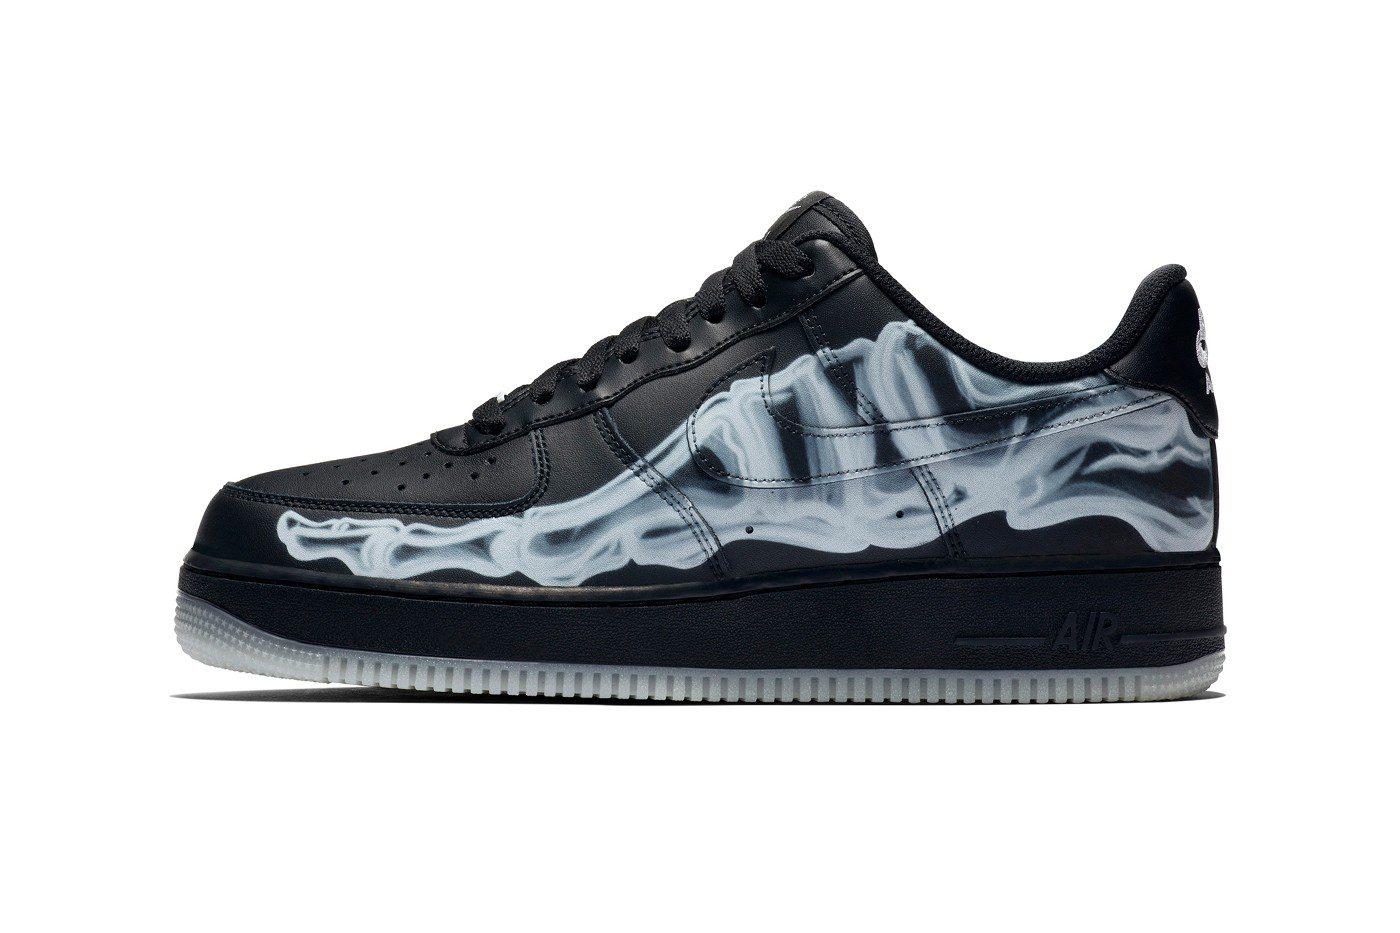 Nike Air Force 1 Black Skeleton